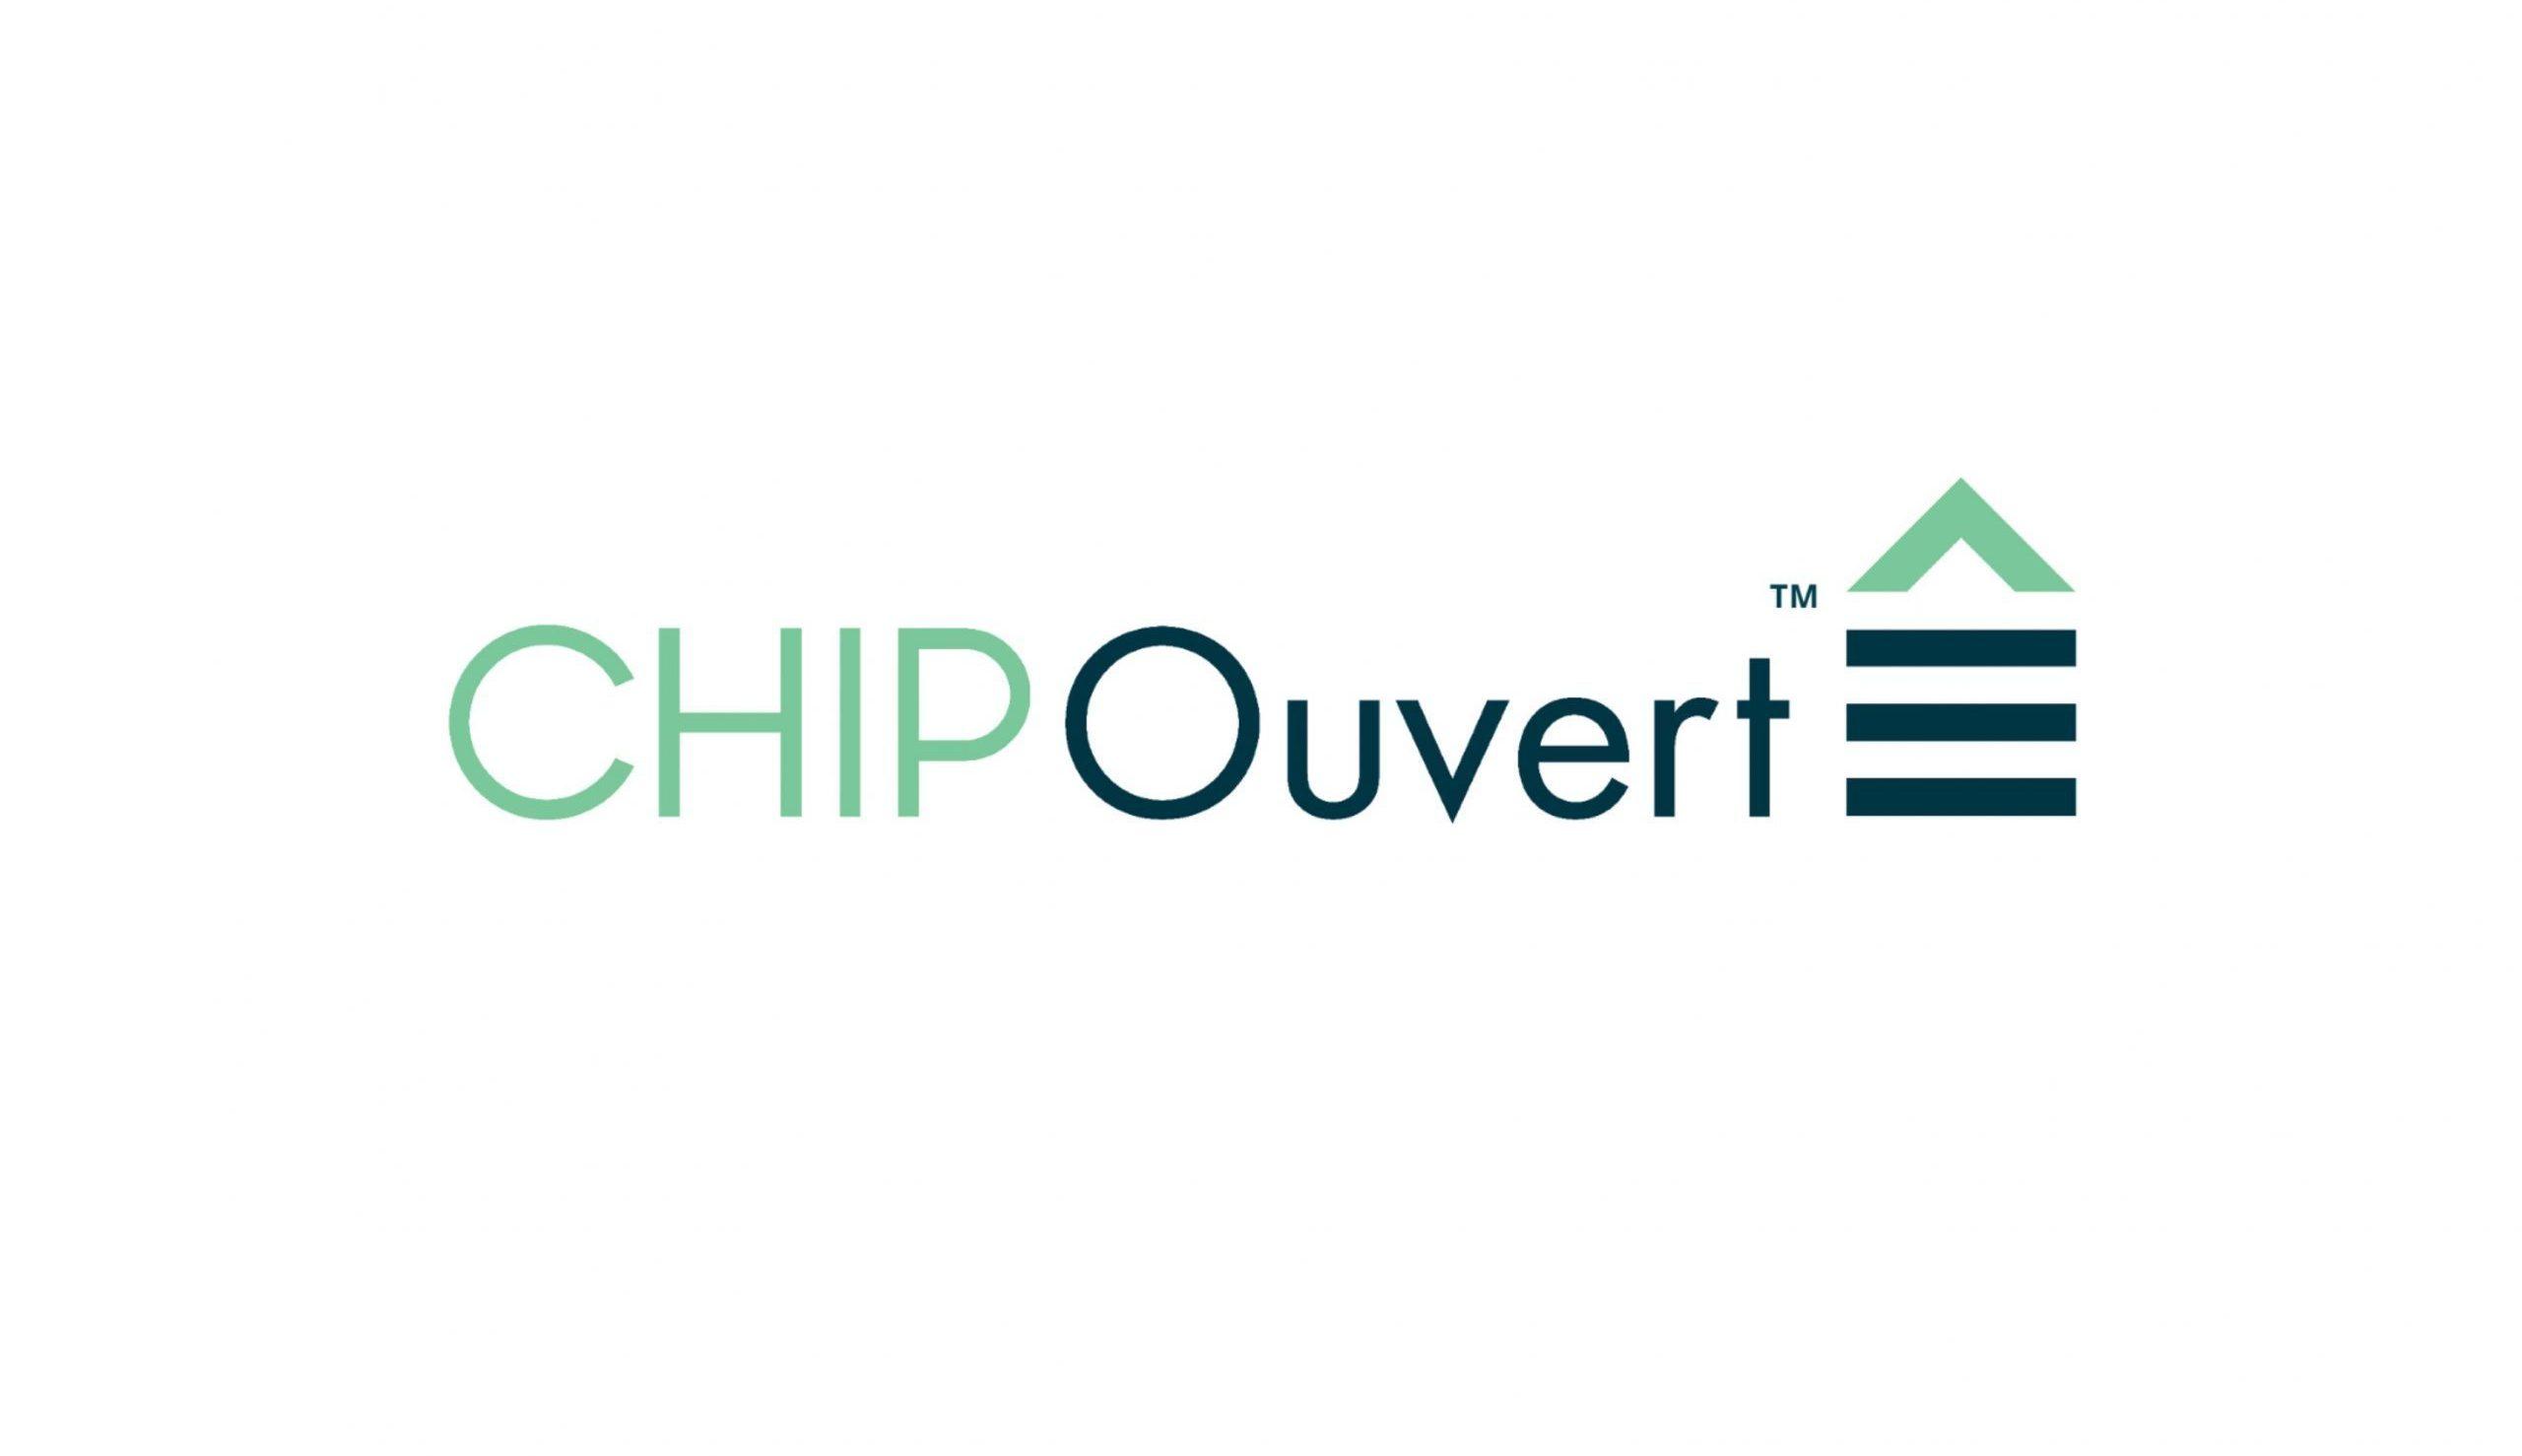 CHIP Ouvert Logo